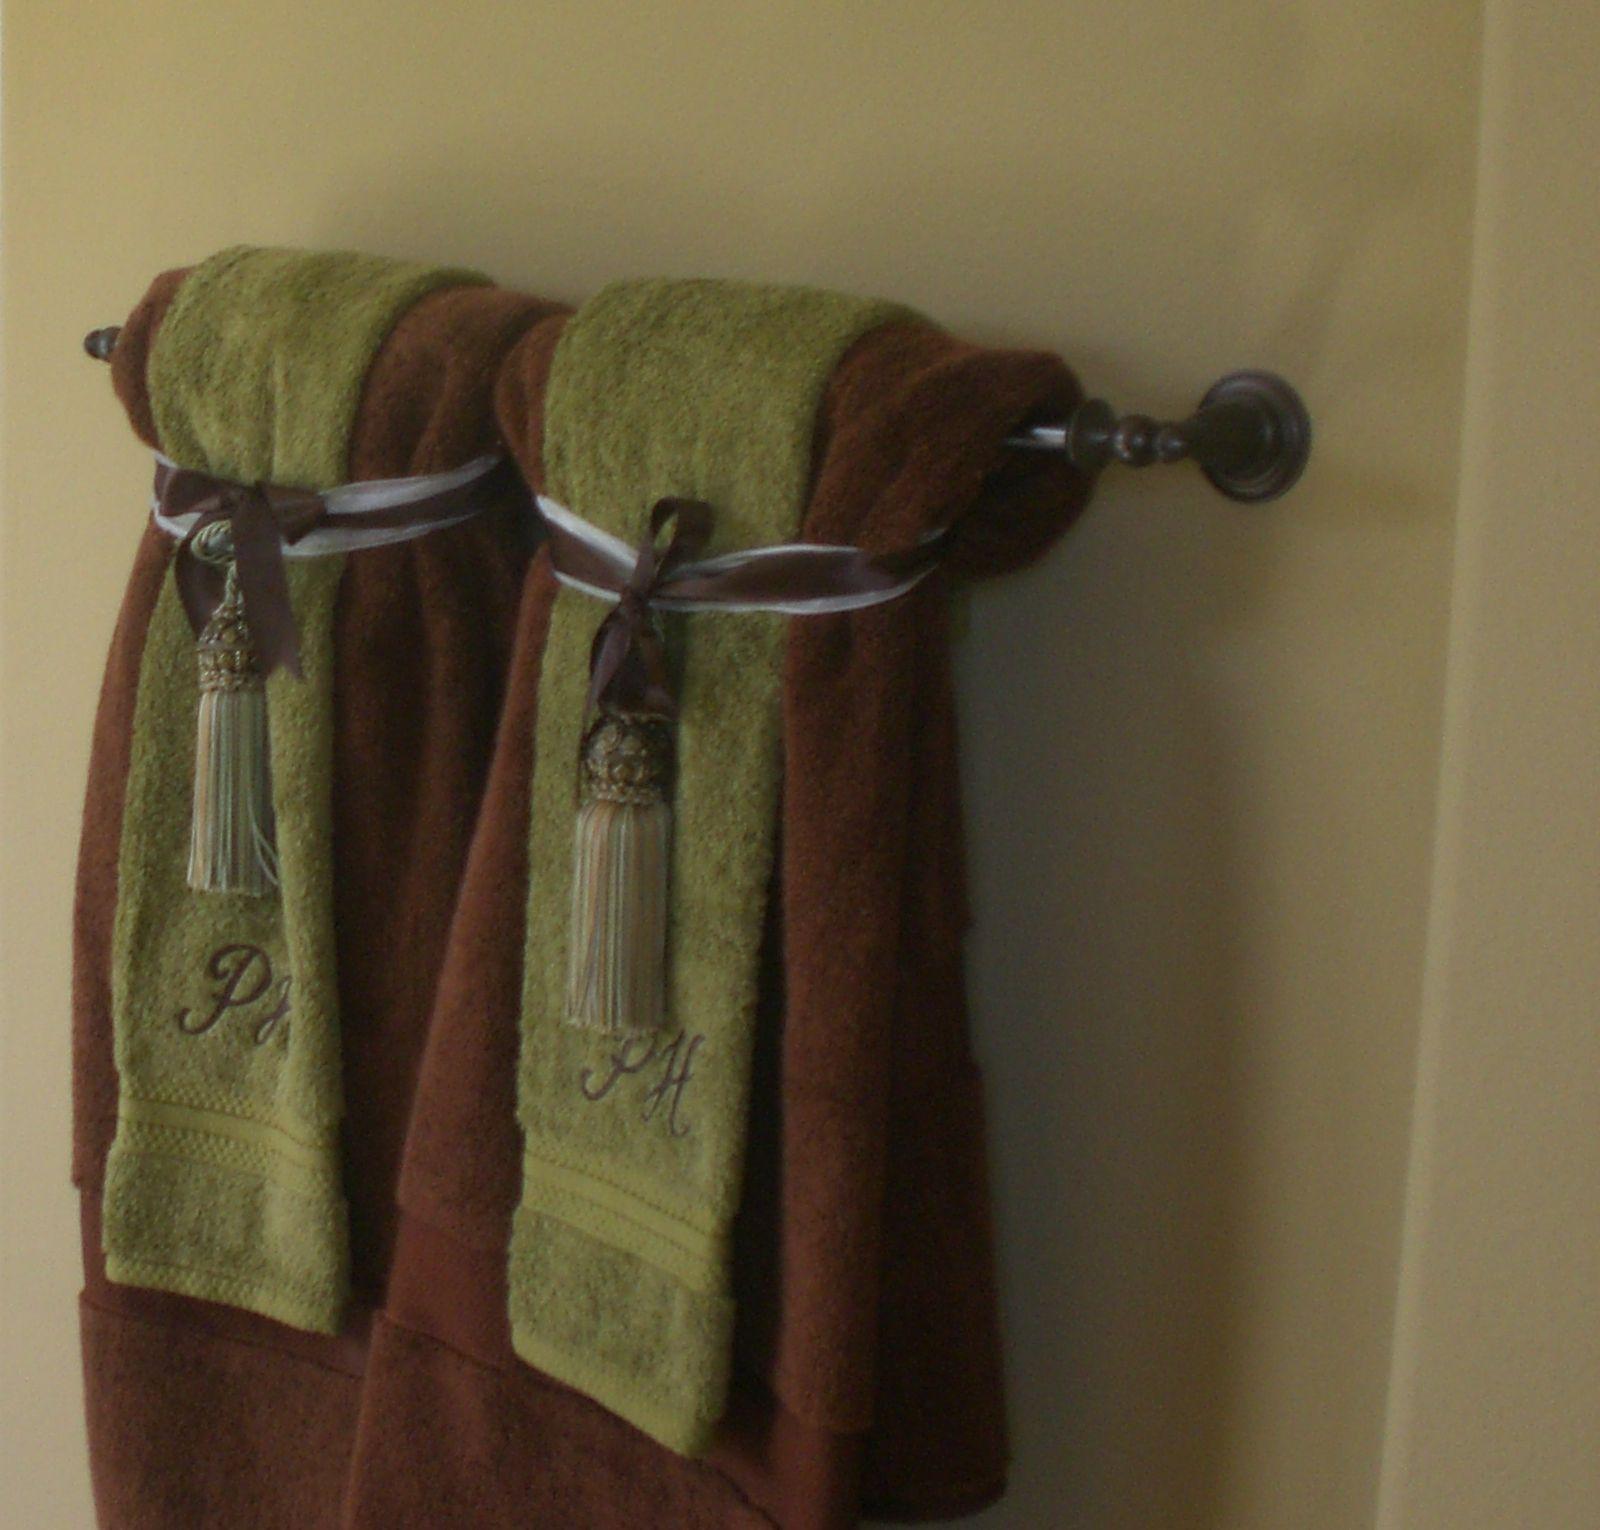 Hanging Bathroom Towels Decoratively